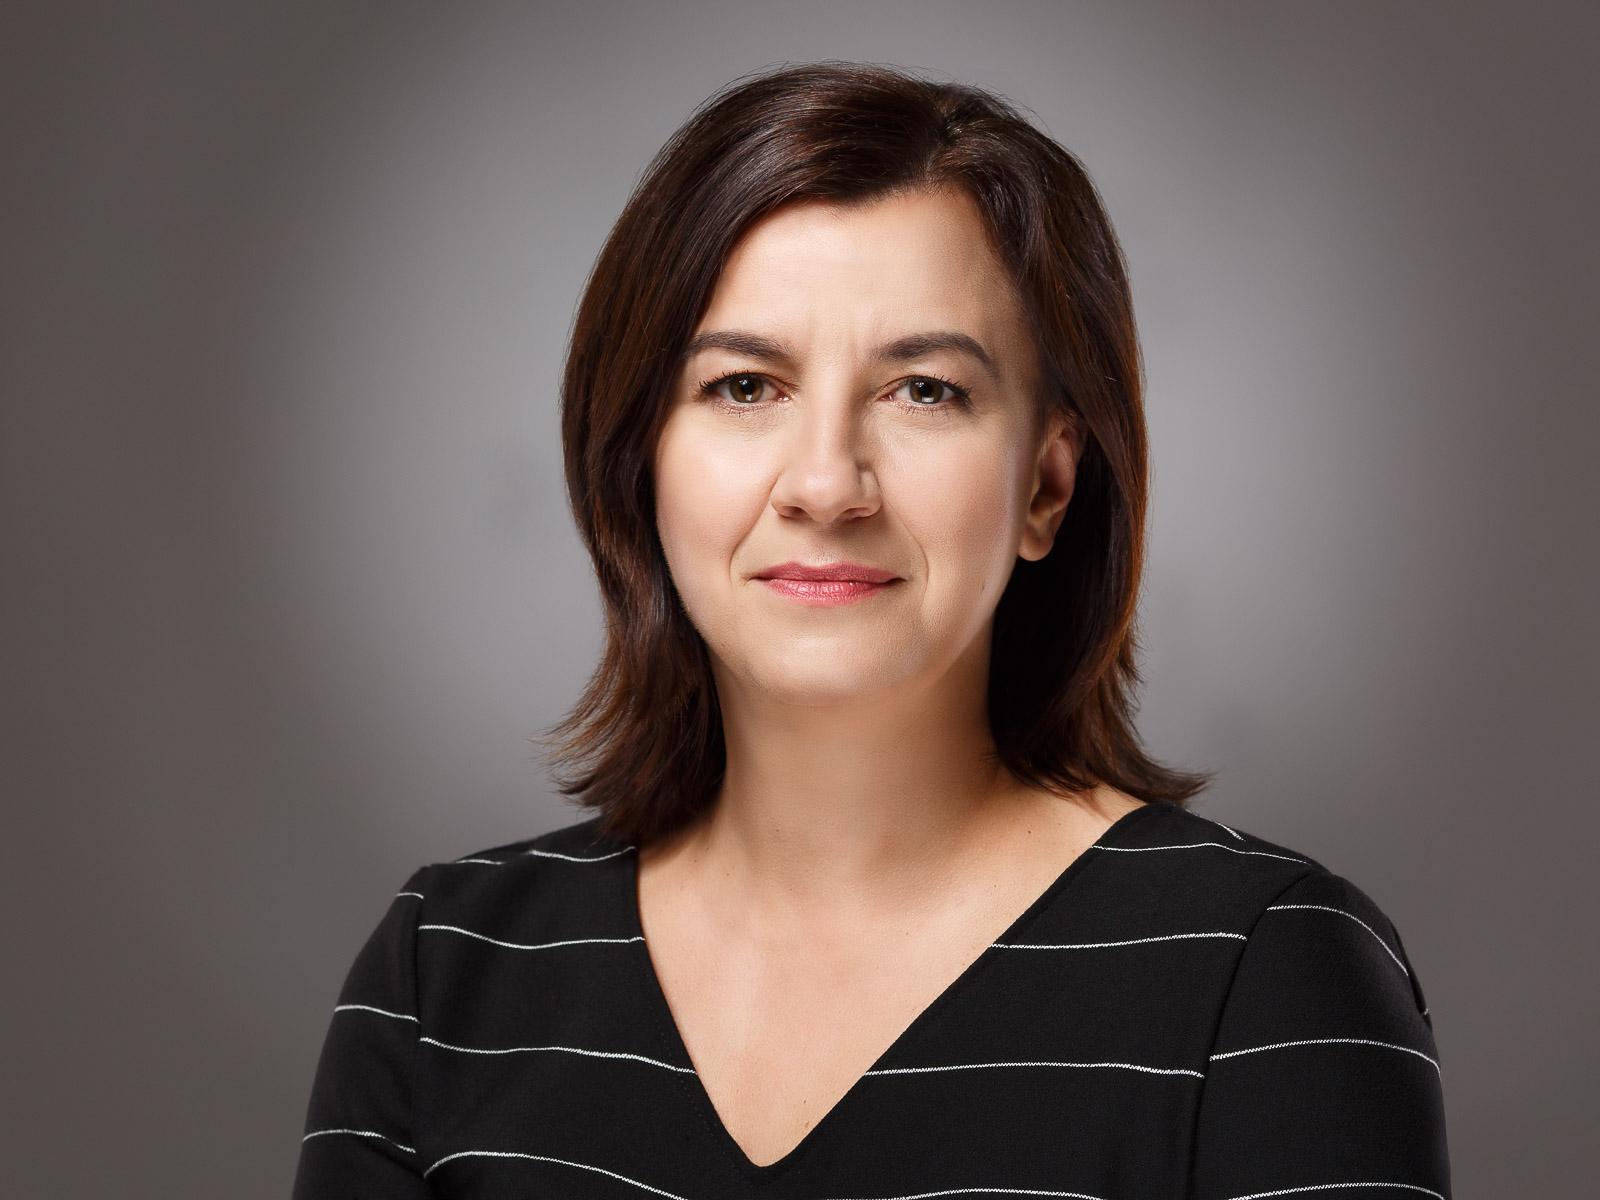 Adwokat Katarzyna Kowalska